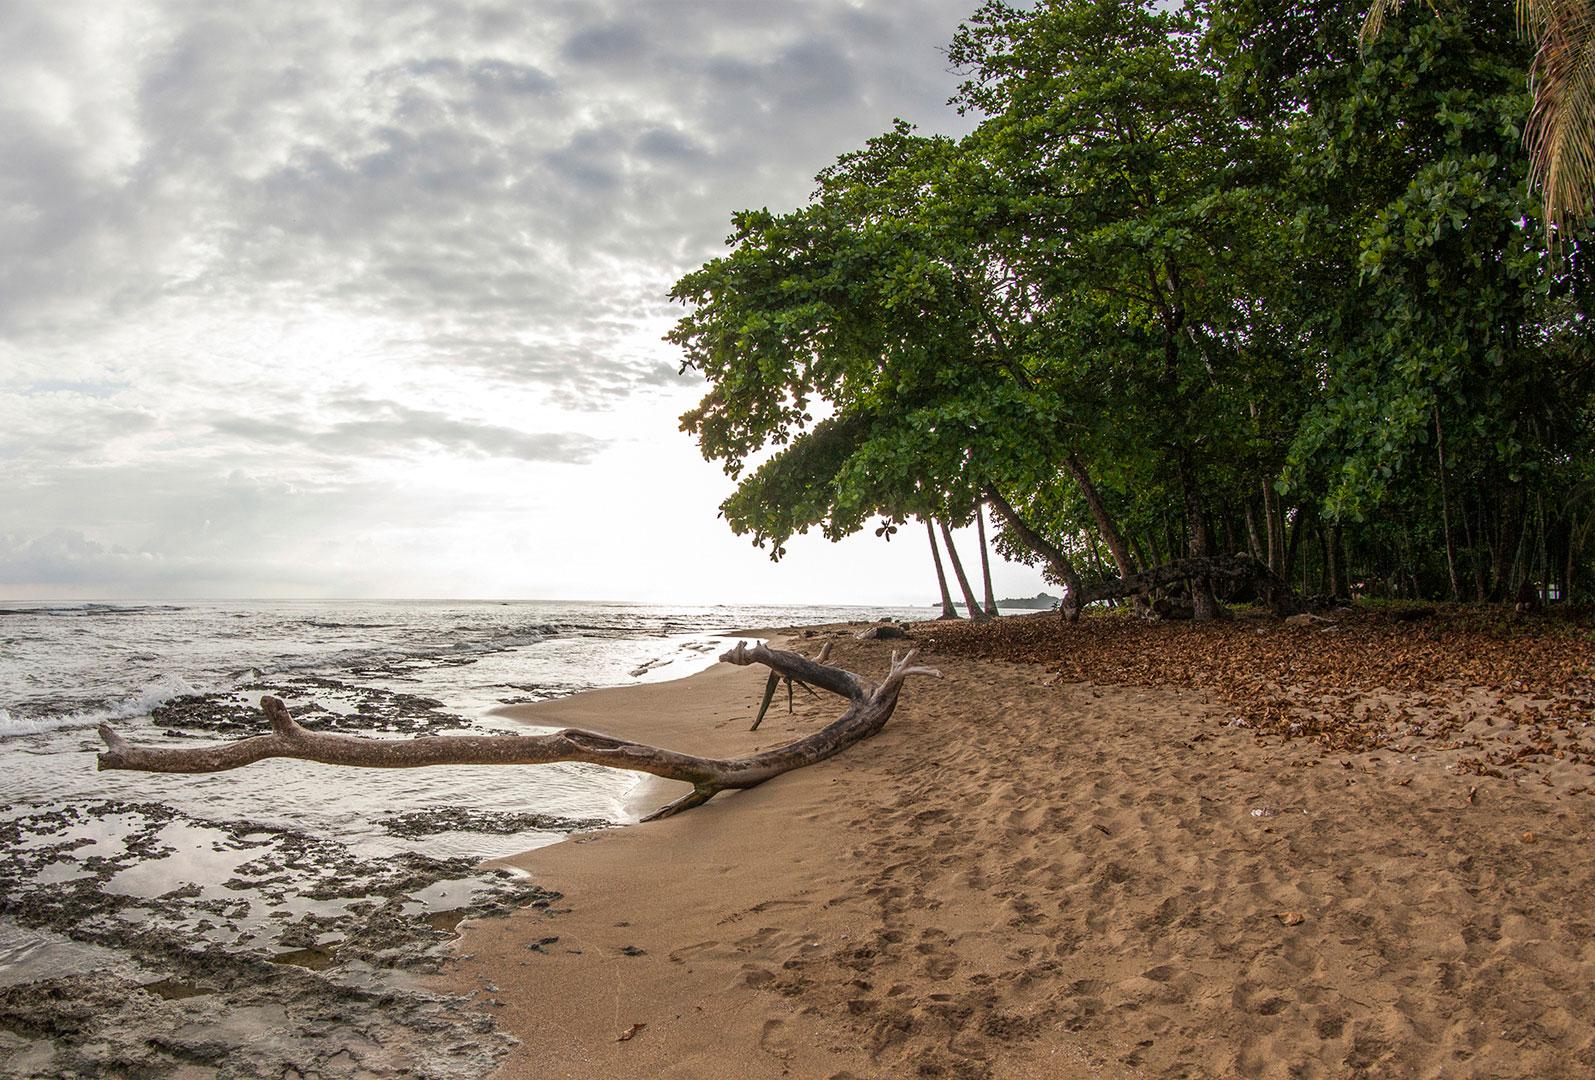 Playa Chiquita, Limón. Costa Rica.